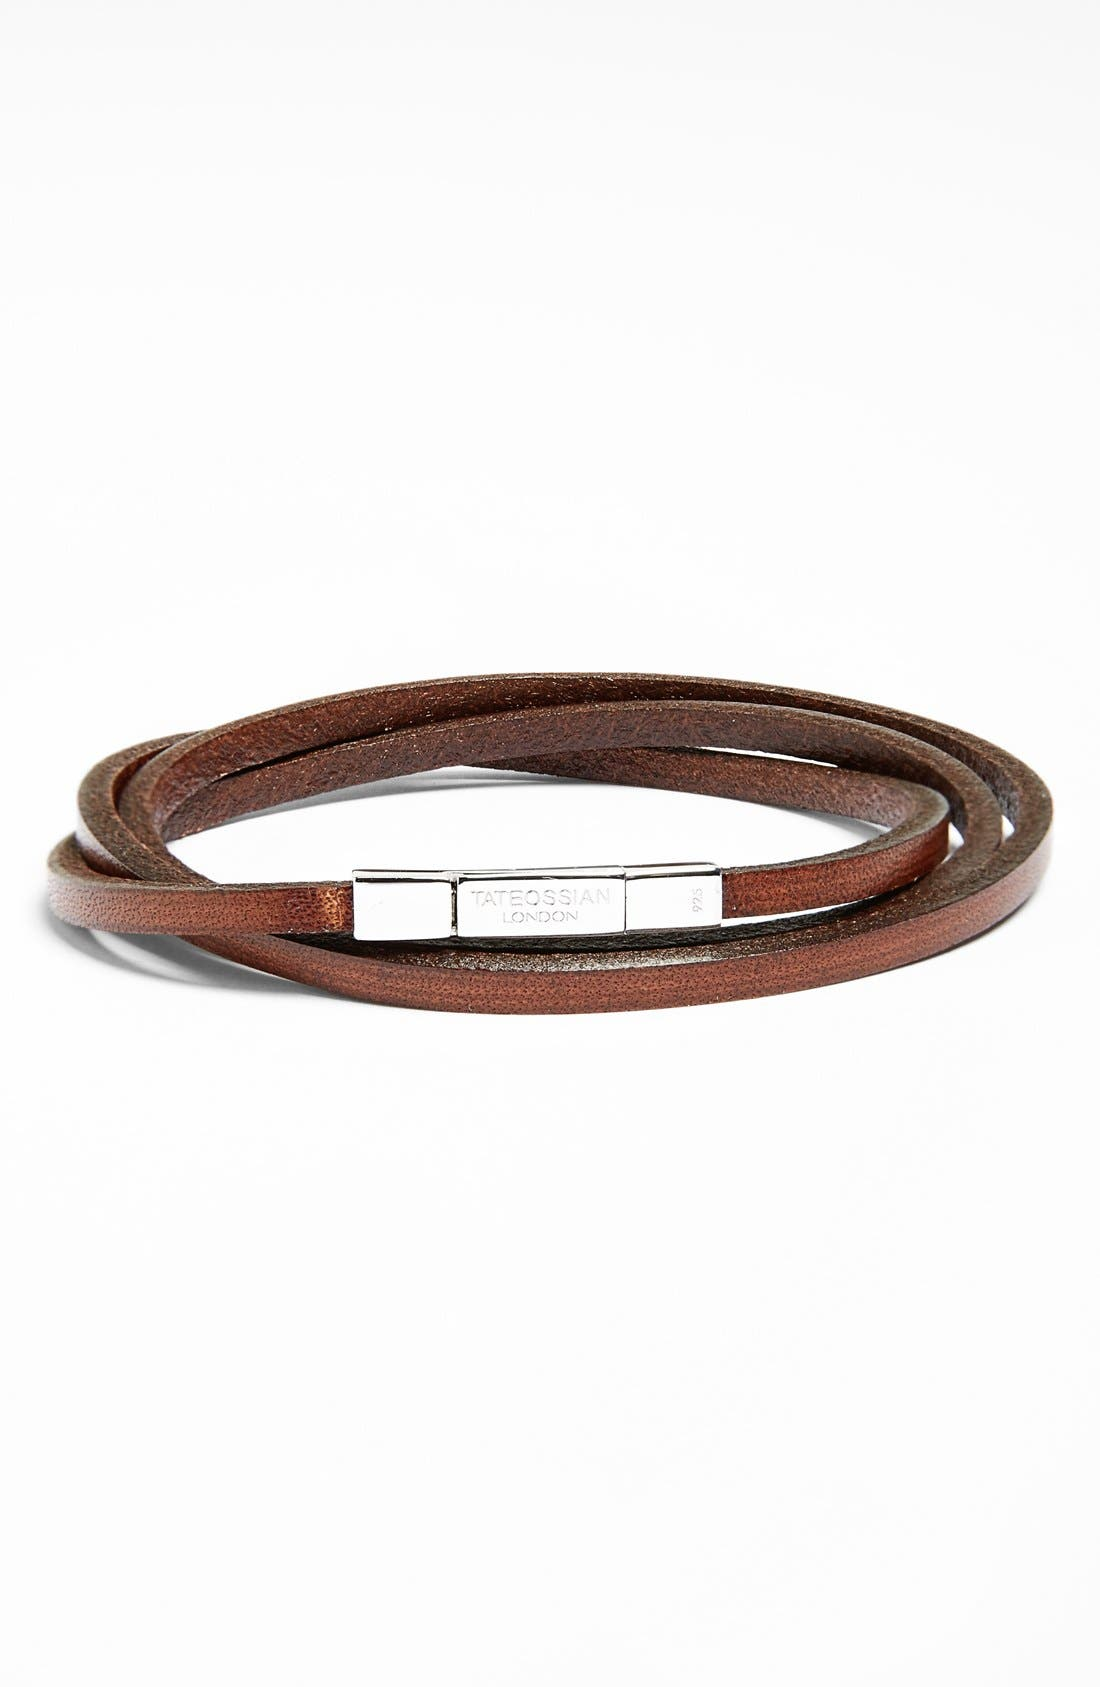 Main Image - Tateossian Leather Wrap Bracelet